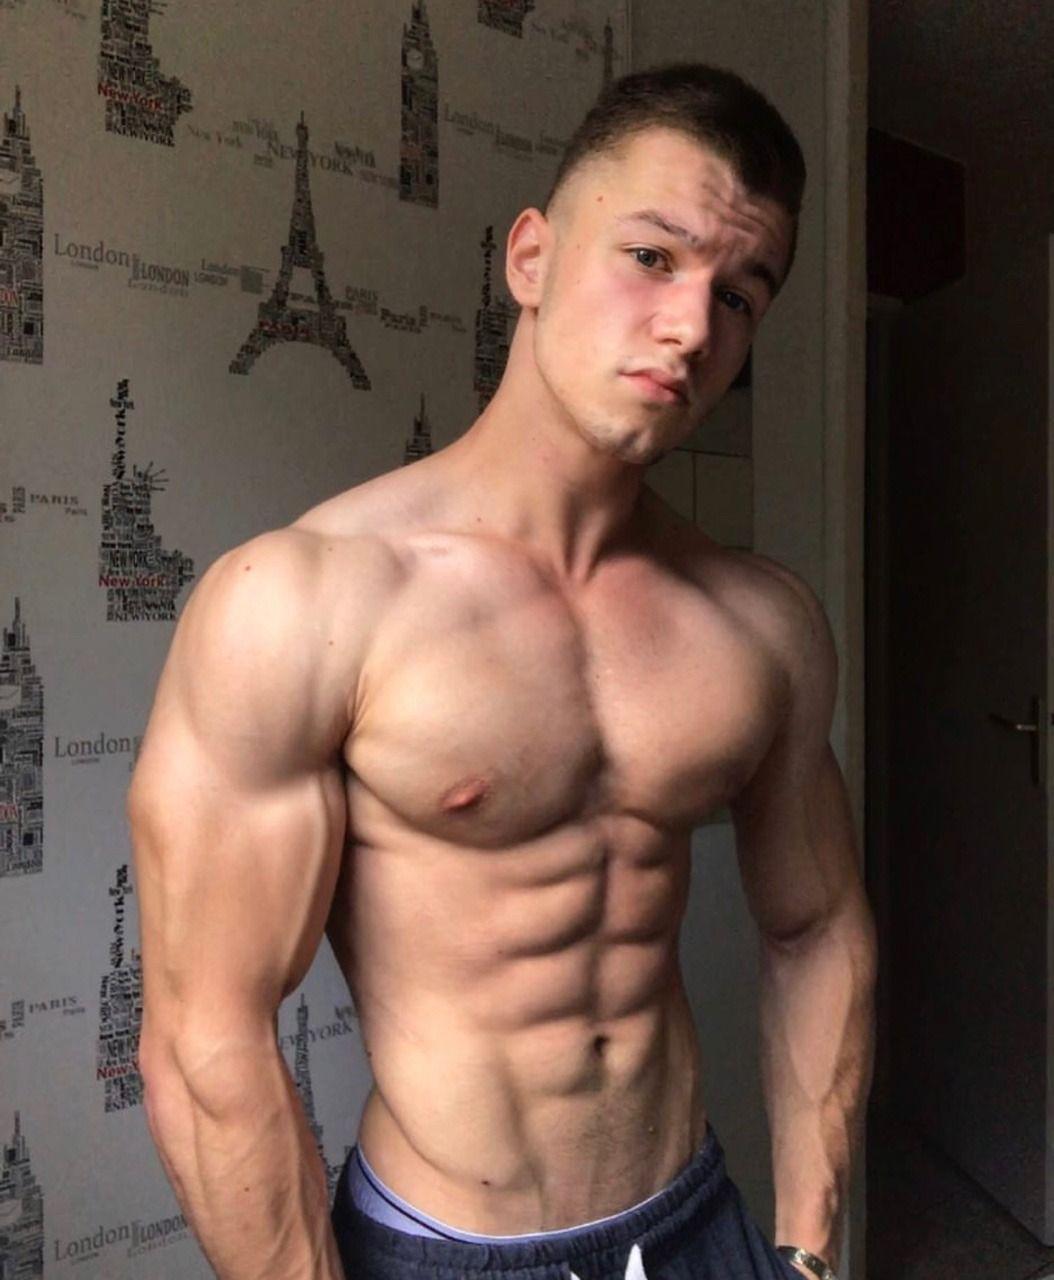 Boyz with plenty of muscle